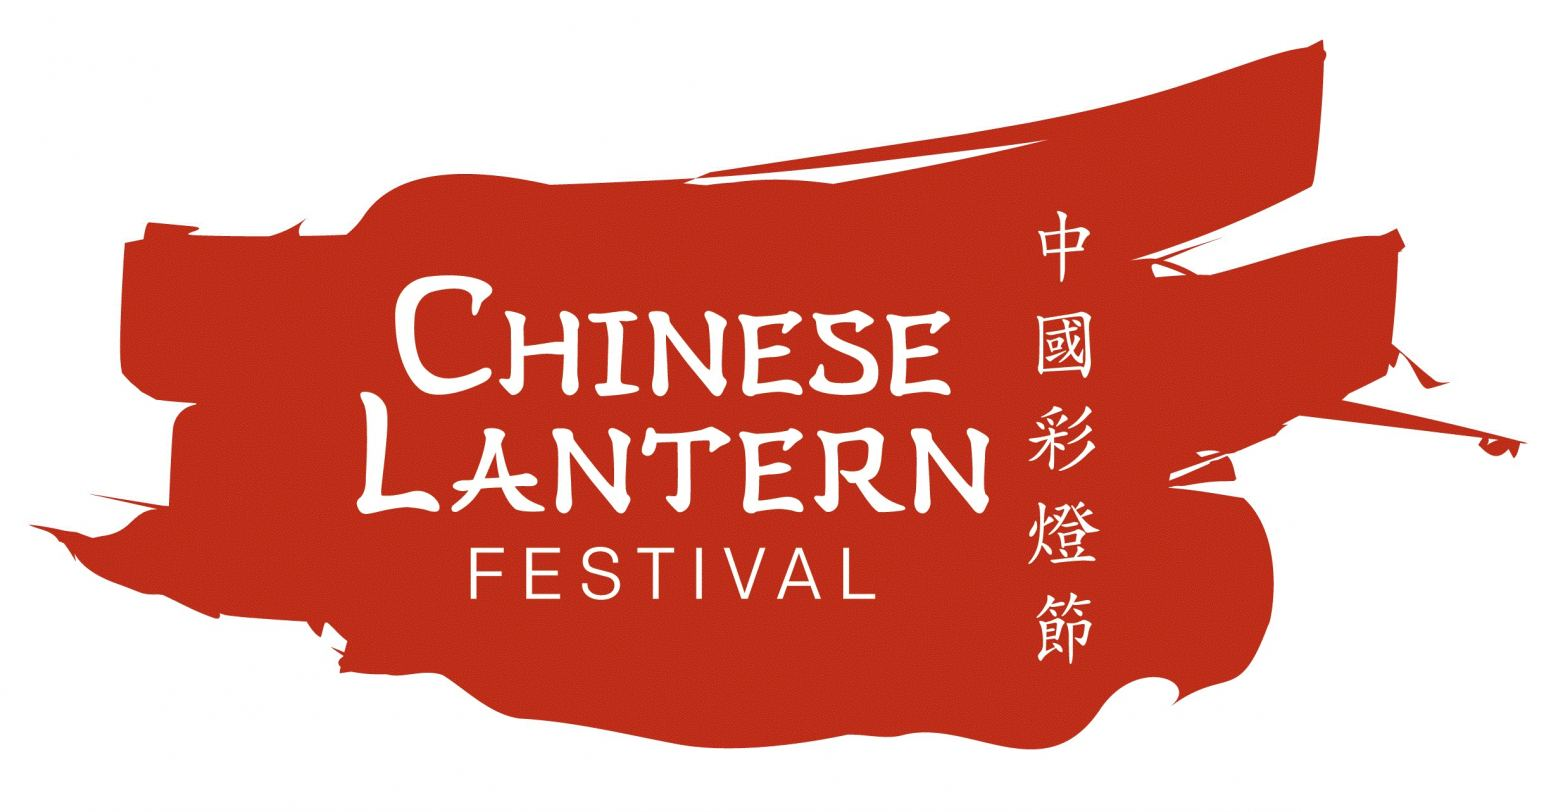 Chinese Lantern Festival, Hanart Culture Logo